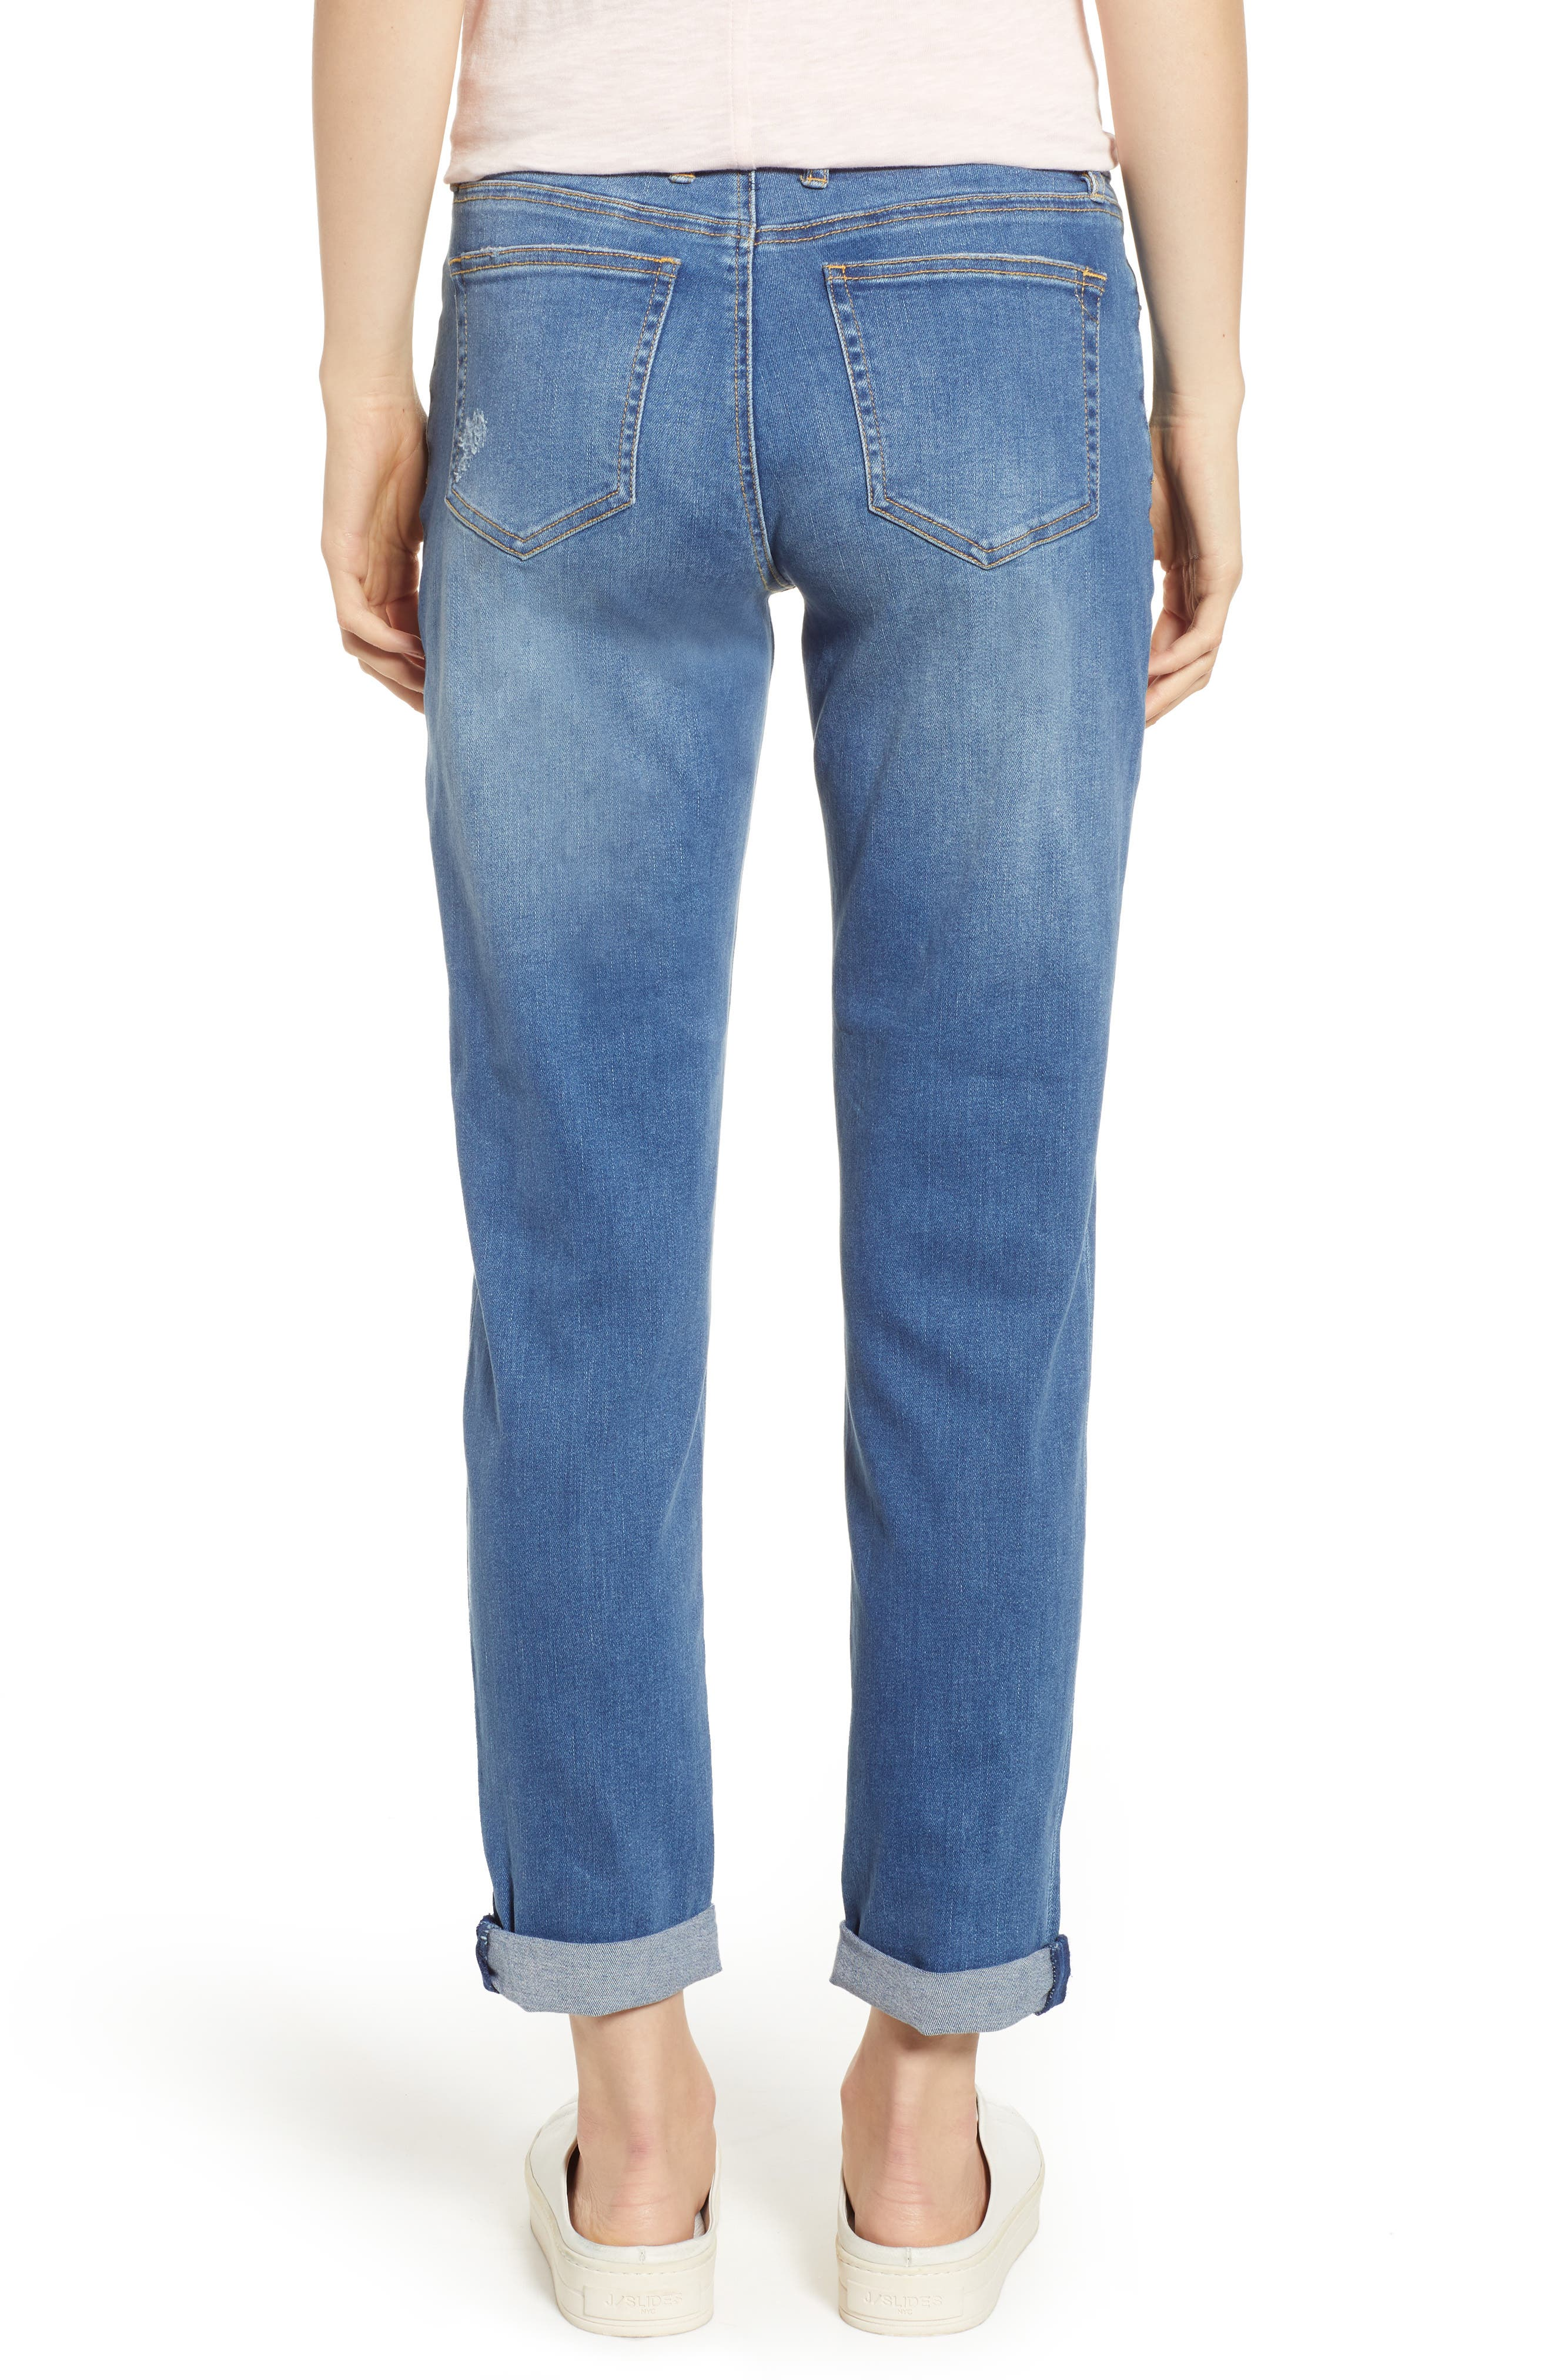 TOMMY BAHAMA, Tema Slim Boyfriend Jeans, Alternate thumbnail 2, color, DARK INDIGO WASH